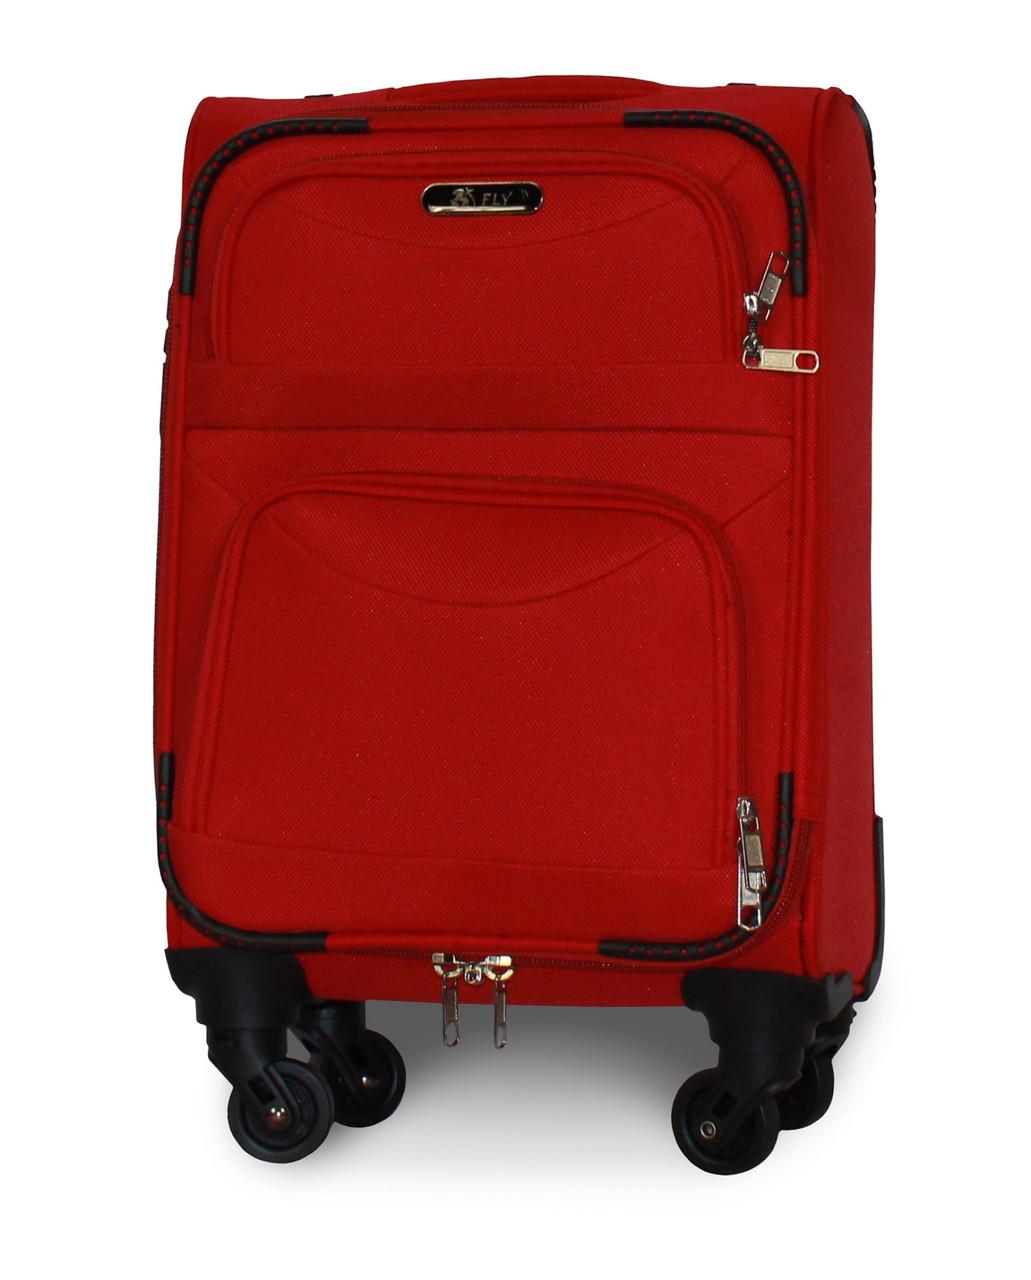 Чемодан Fly 6802 мини 46х32х20 см Ручная кладь на 4 колесах Красный